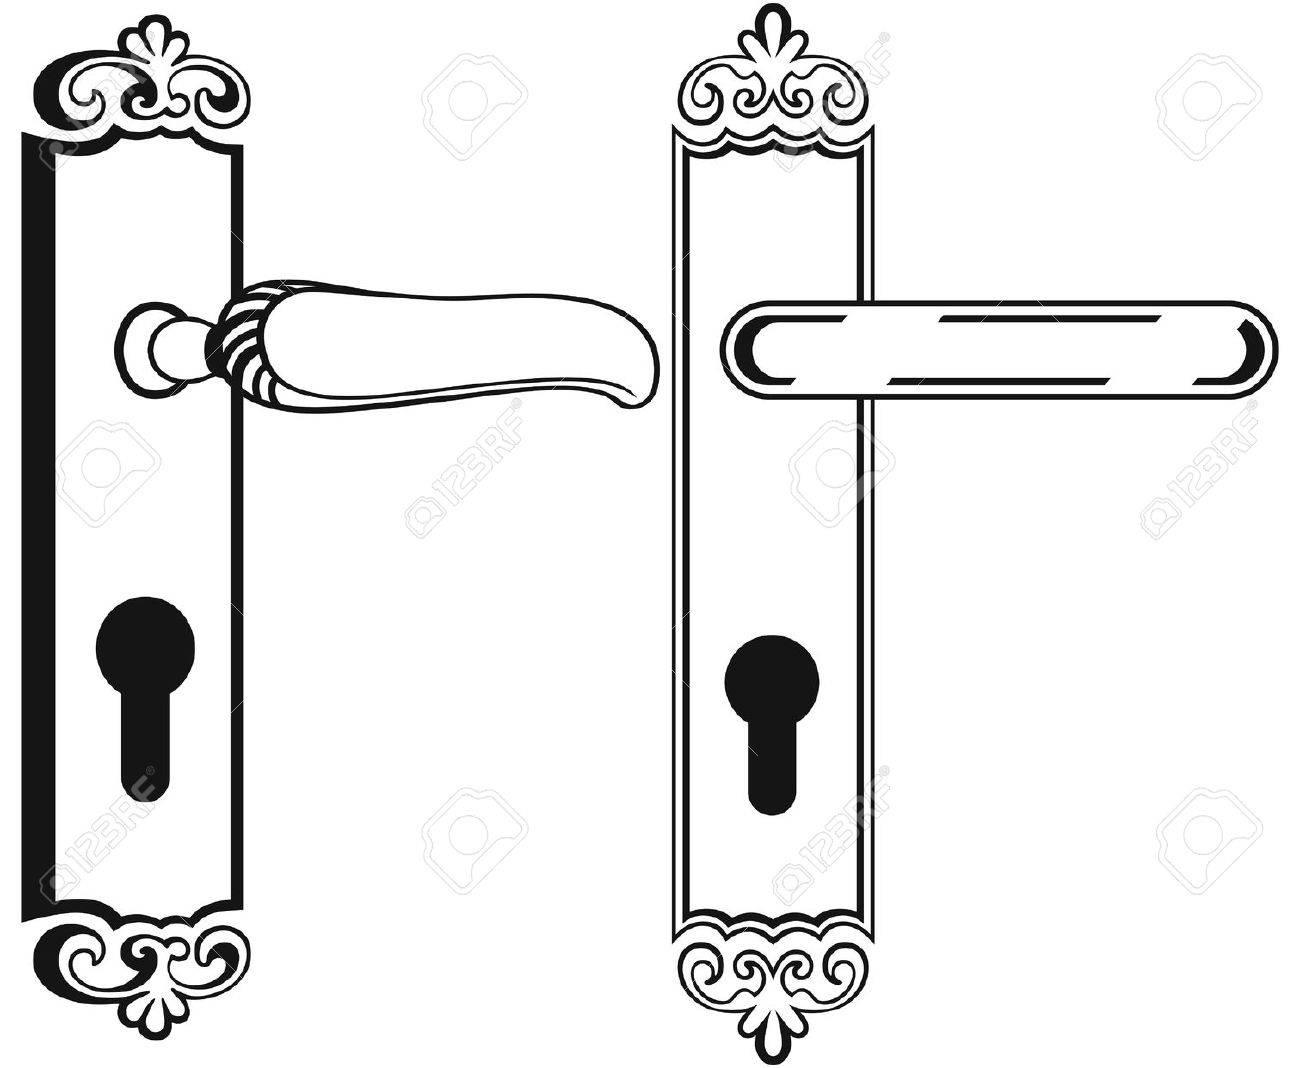 Door leaf drawing convention the location drawing joshua nava arts - Door Handle Symbol Stock Vector 20543981